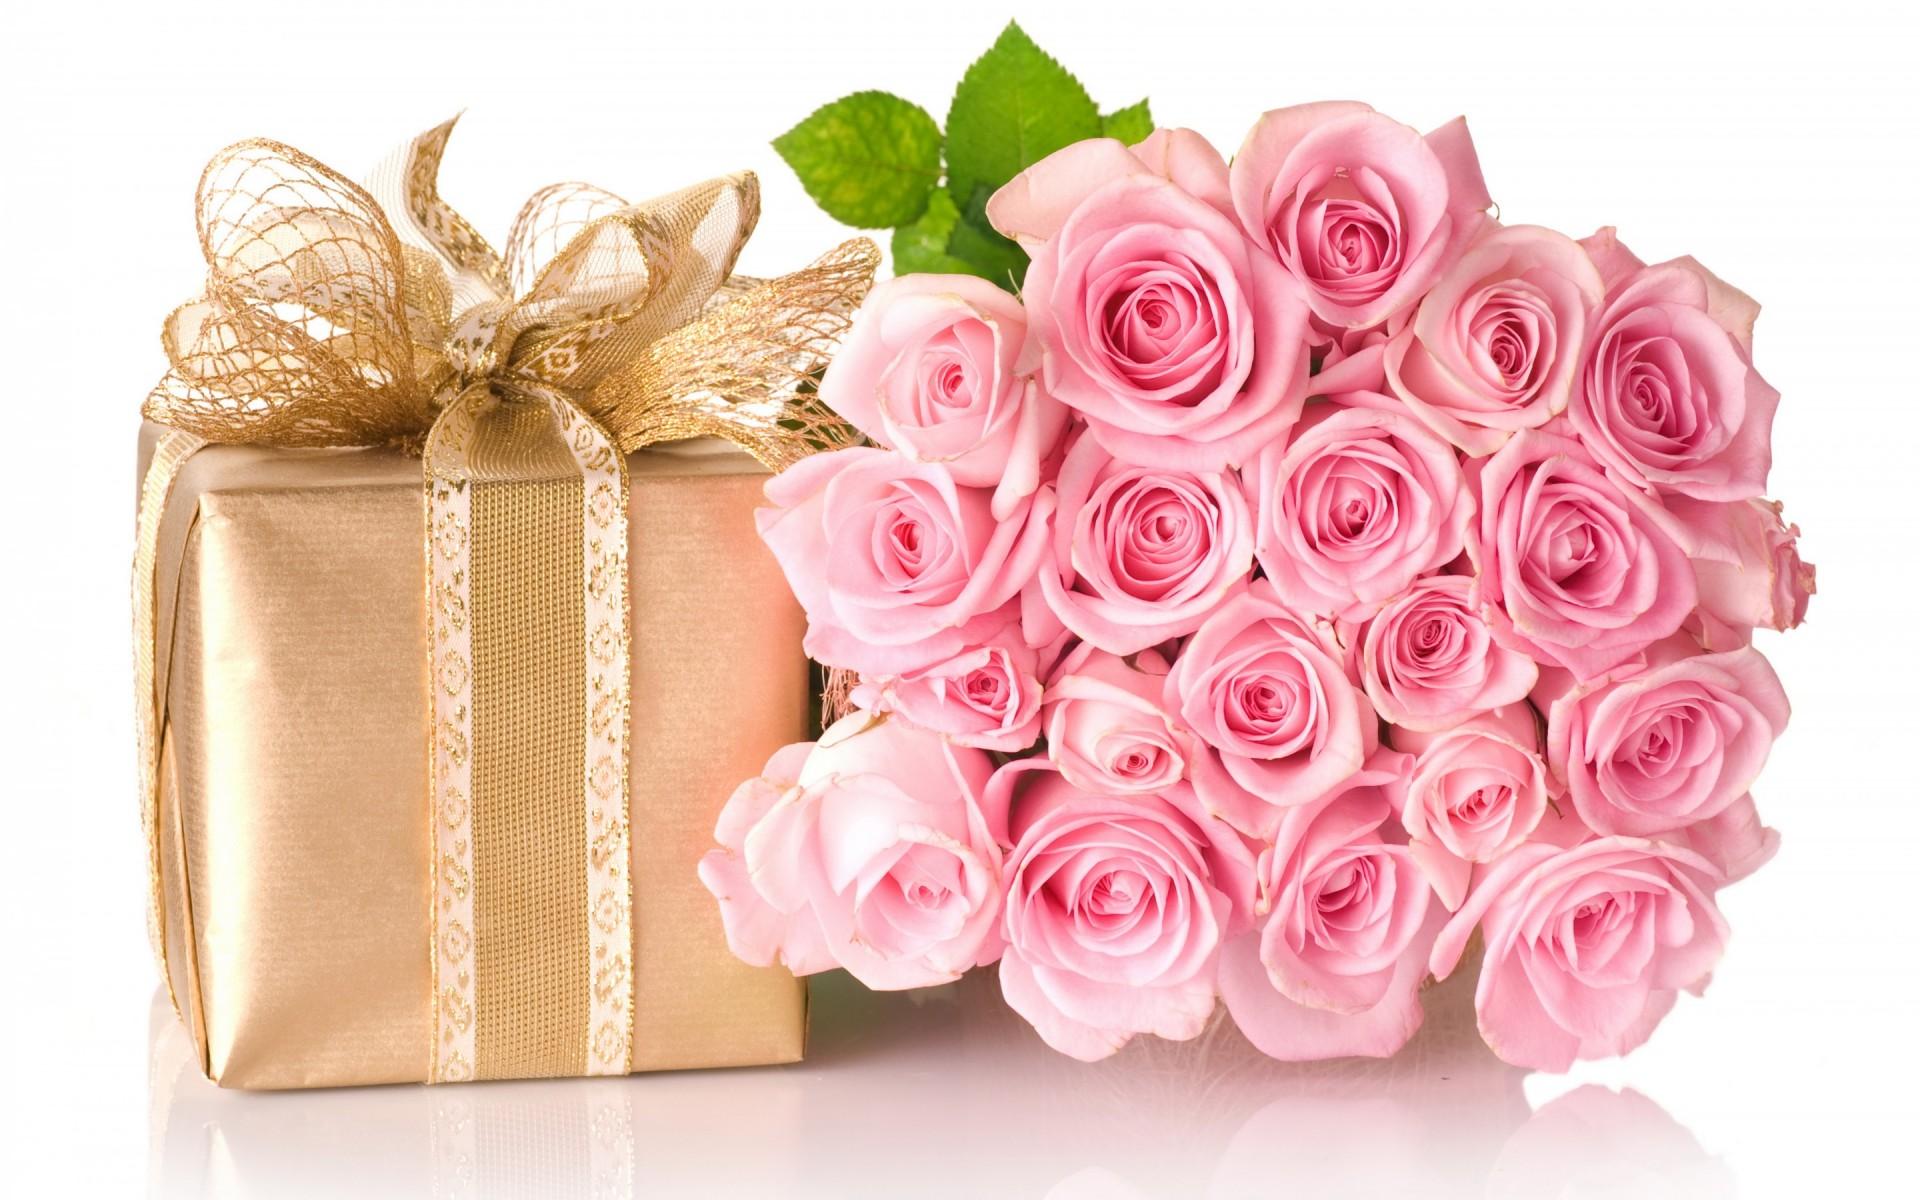 Happy Birthday Roses Bouquet Wallpaper